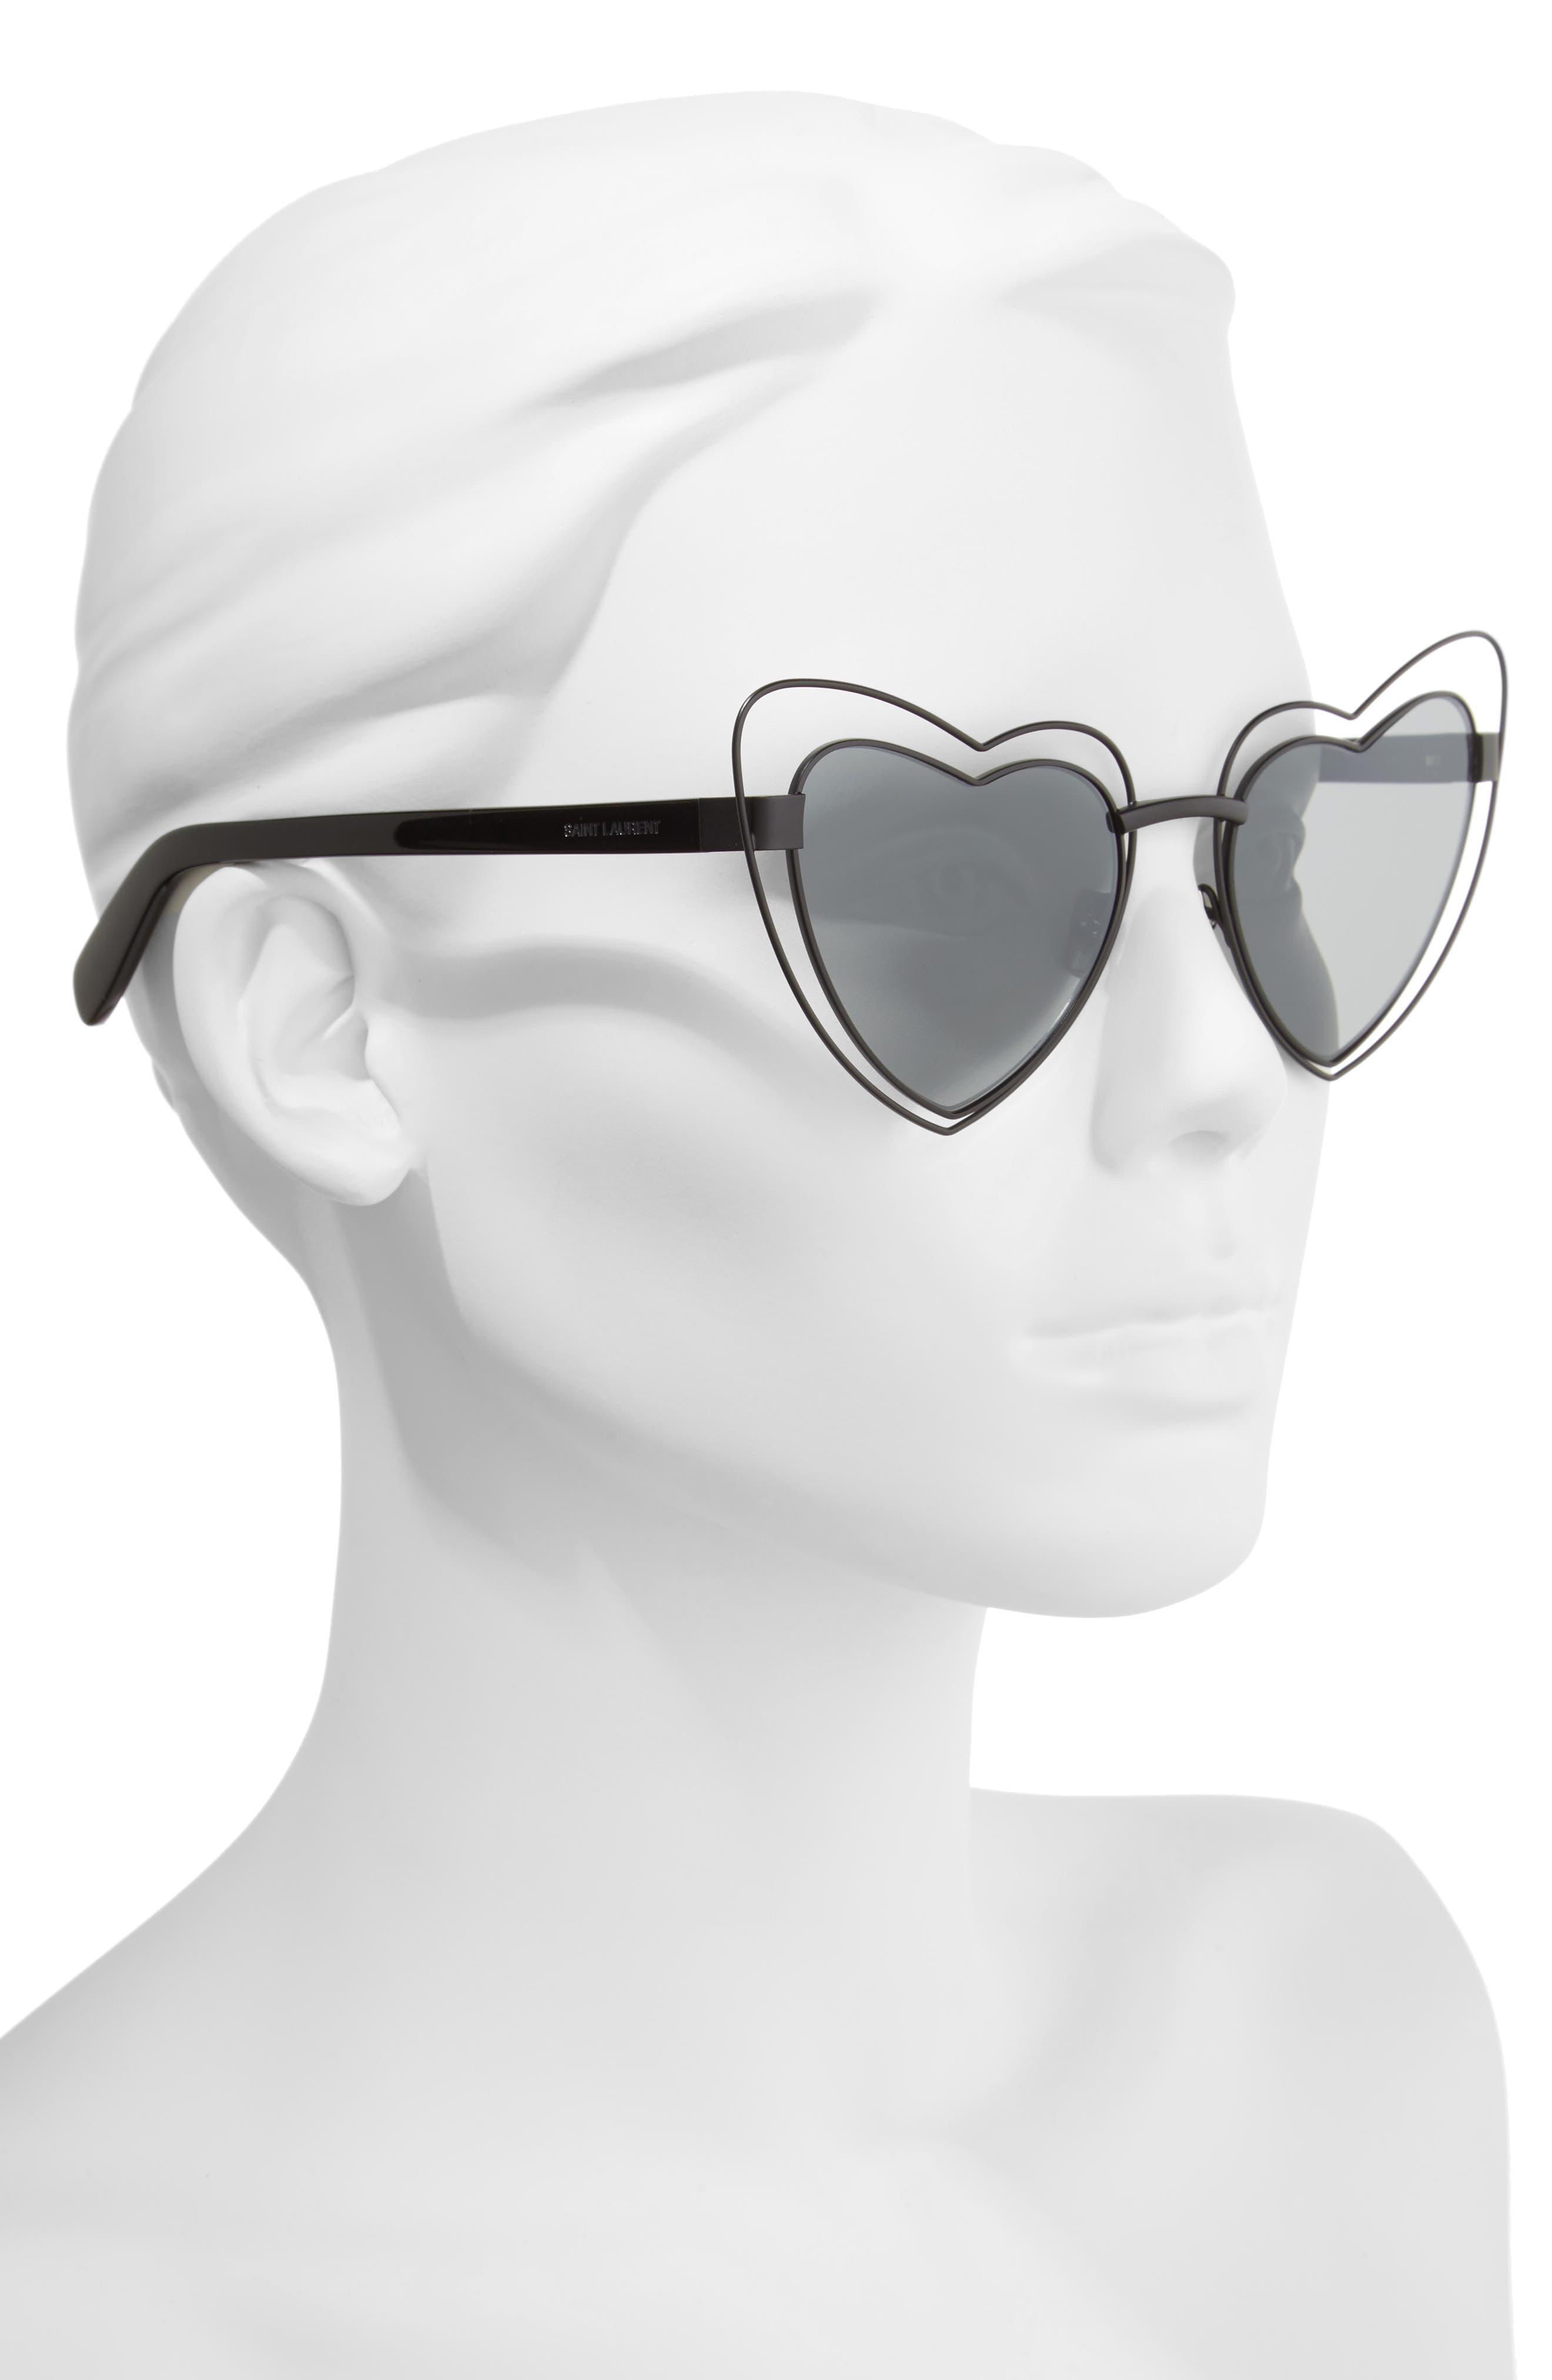 SL197 Loulou 57mm Heart Shaped Sunglasses,                             Alternate thumbnail 2, color,                             001